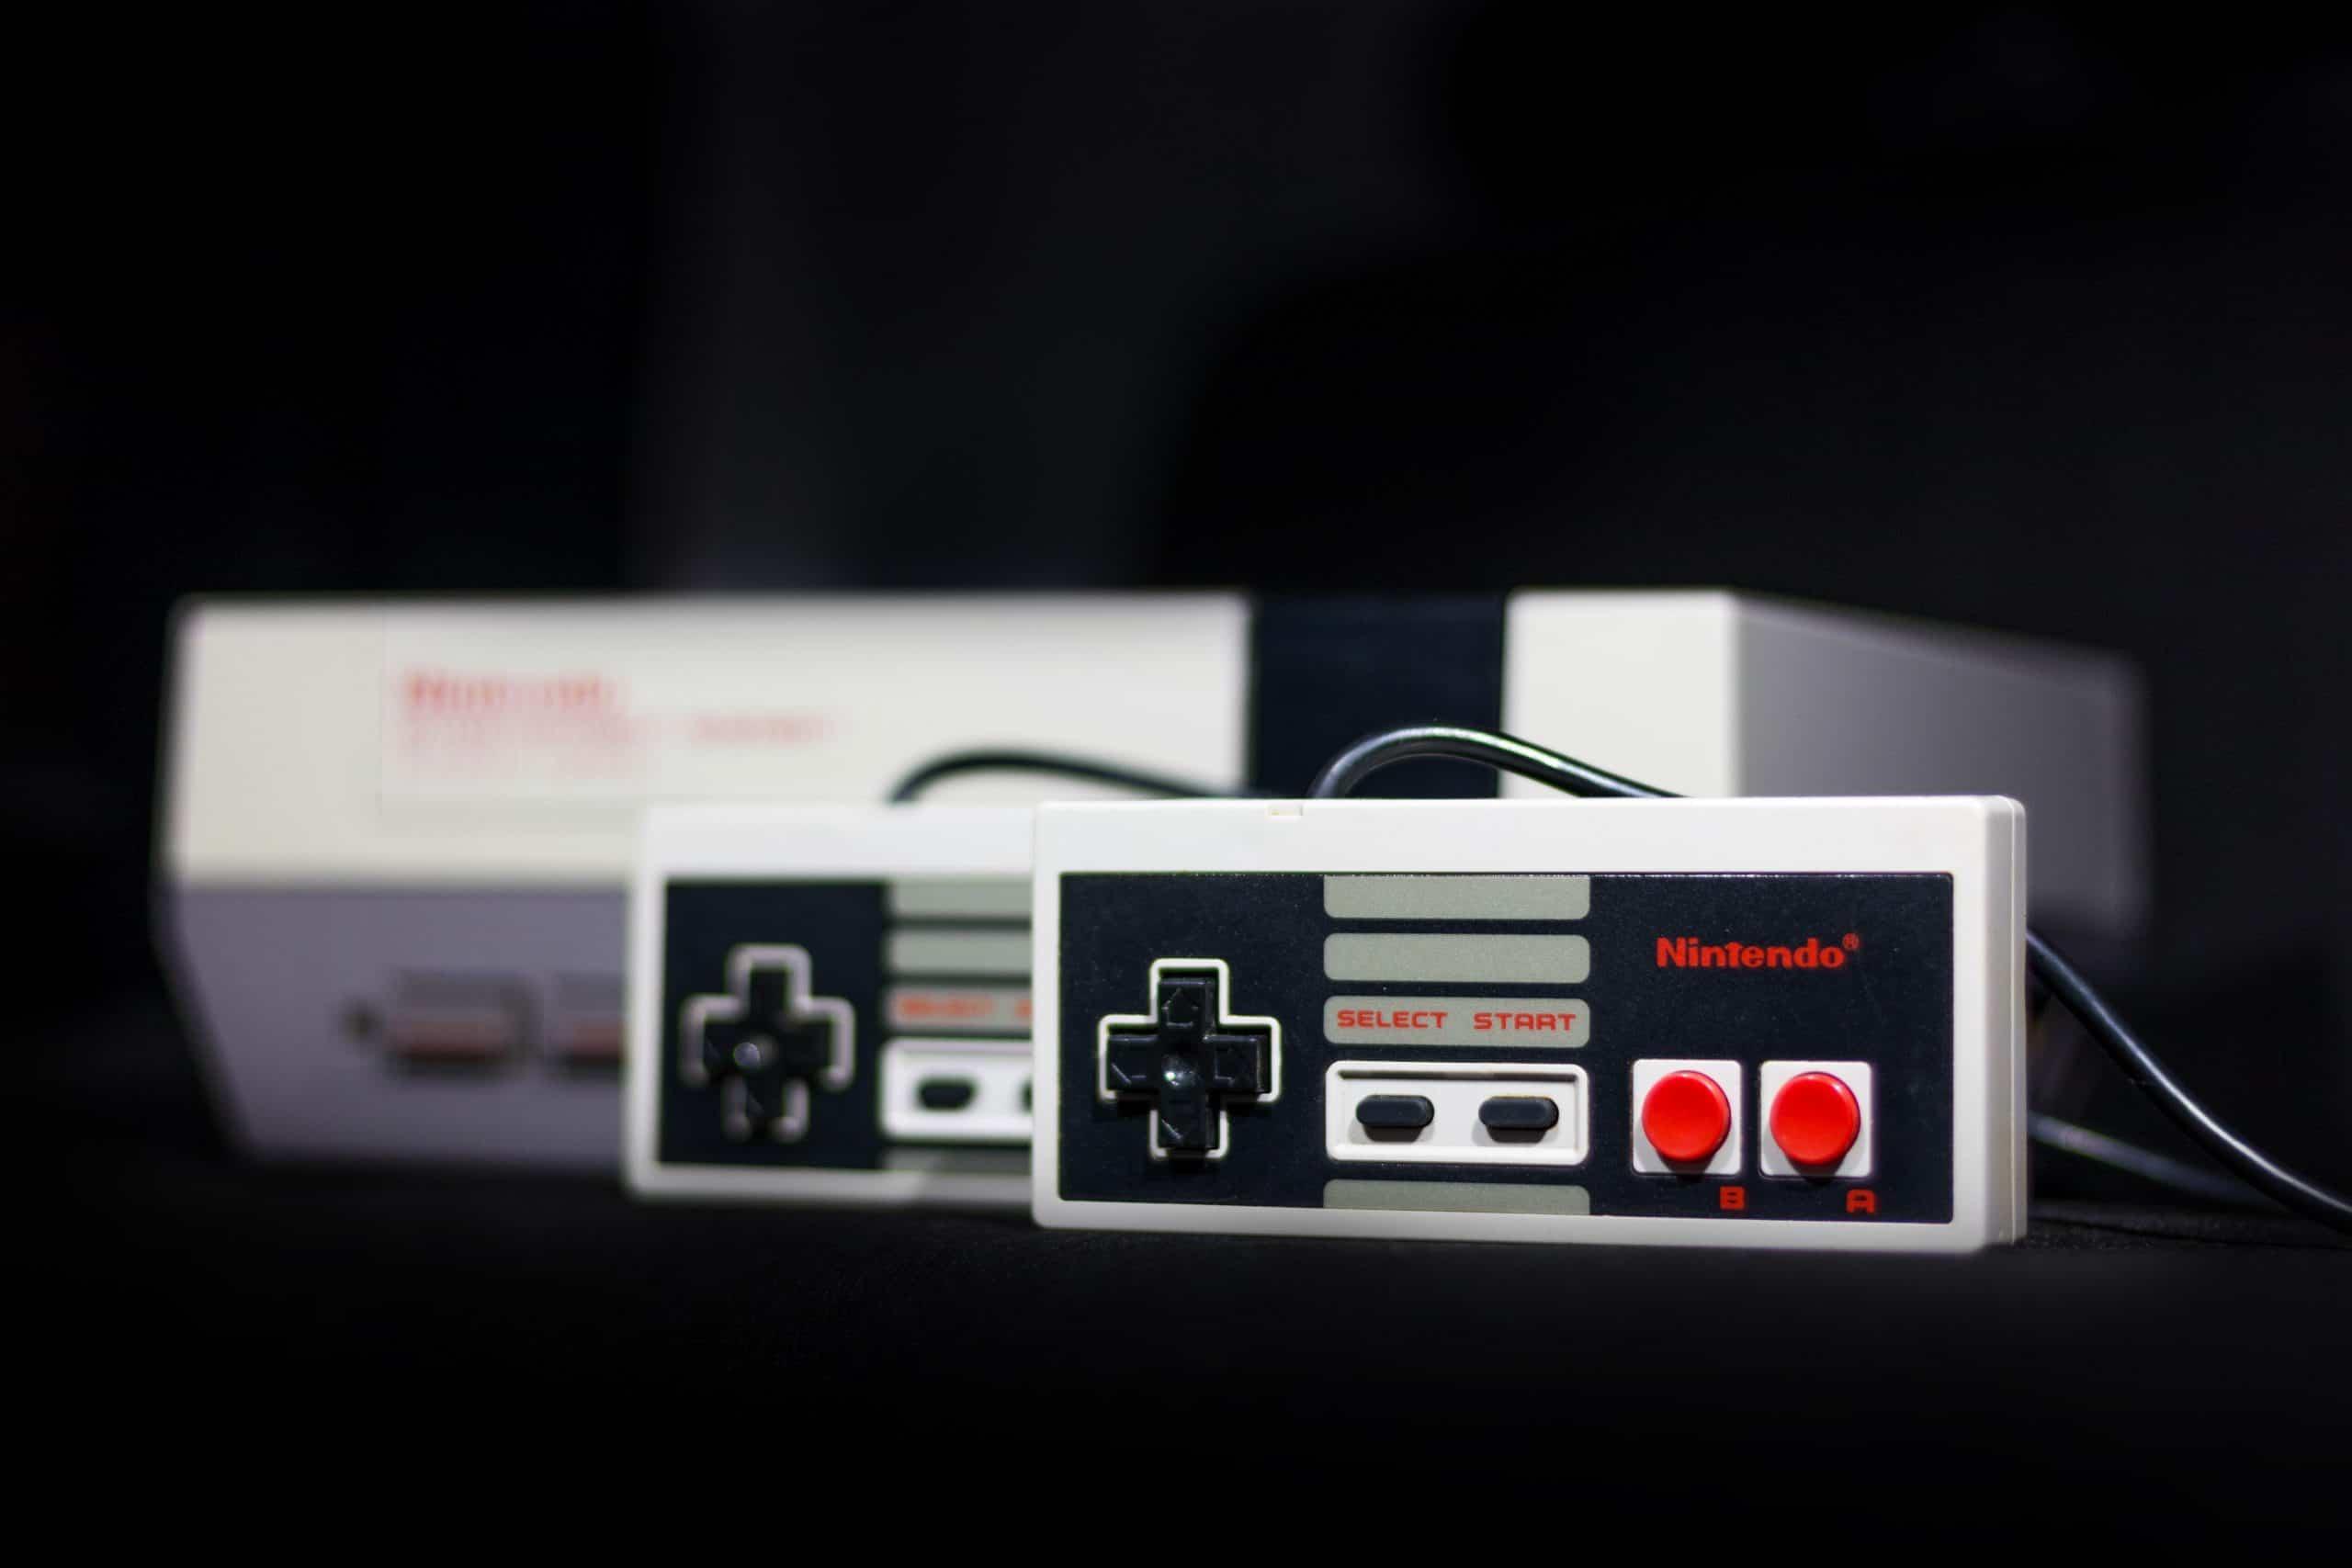 Nintendo (NES)